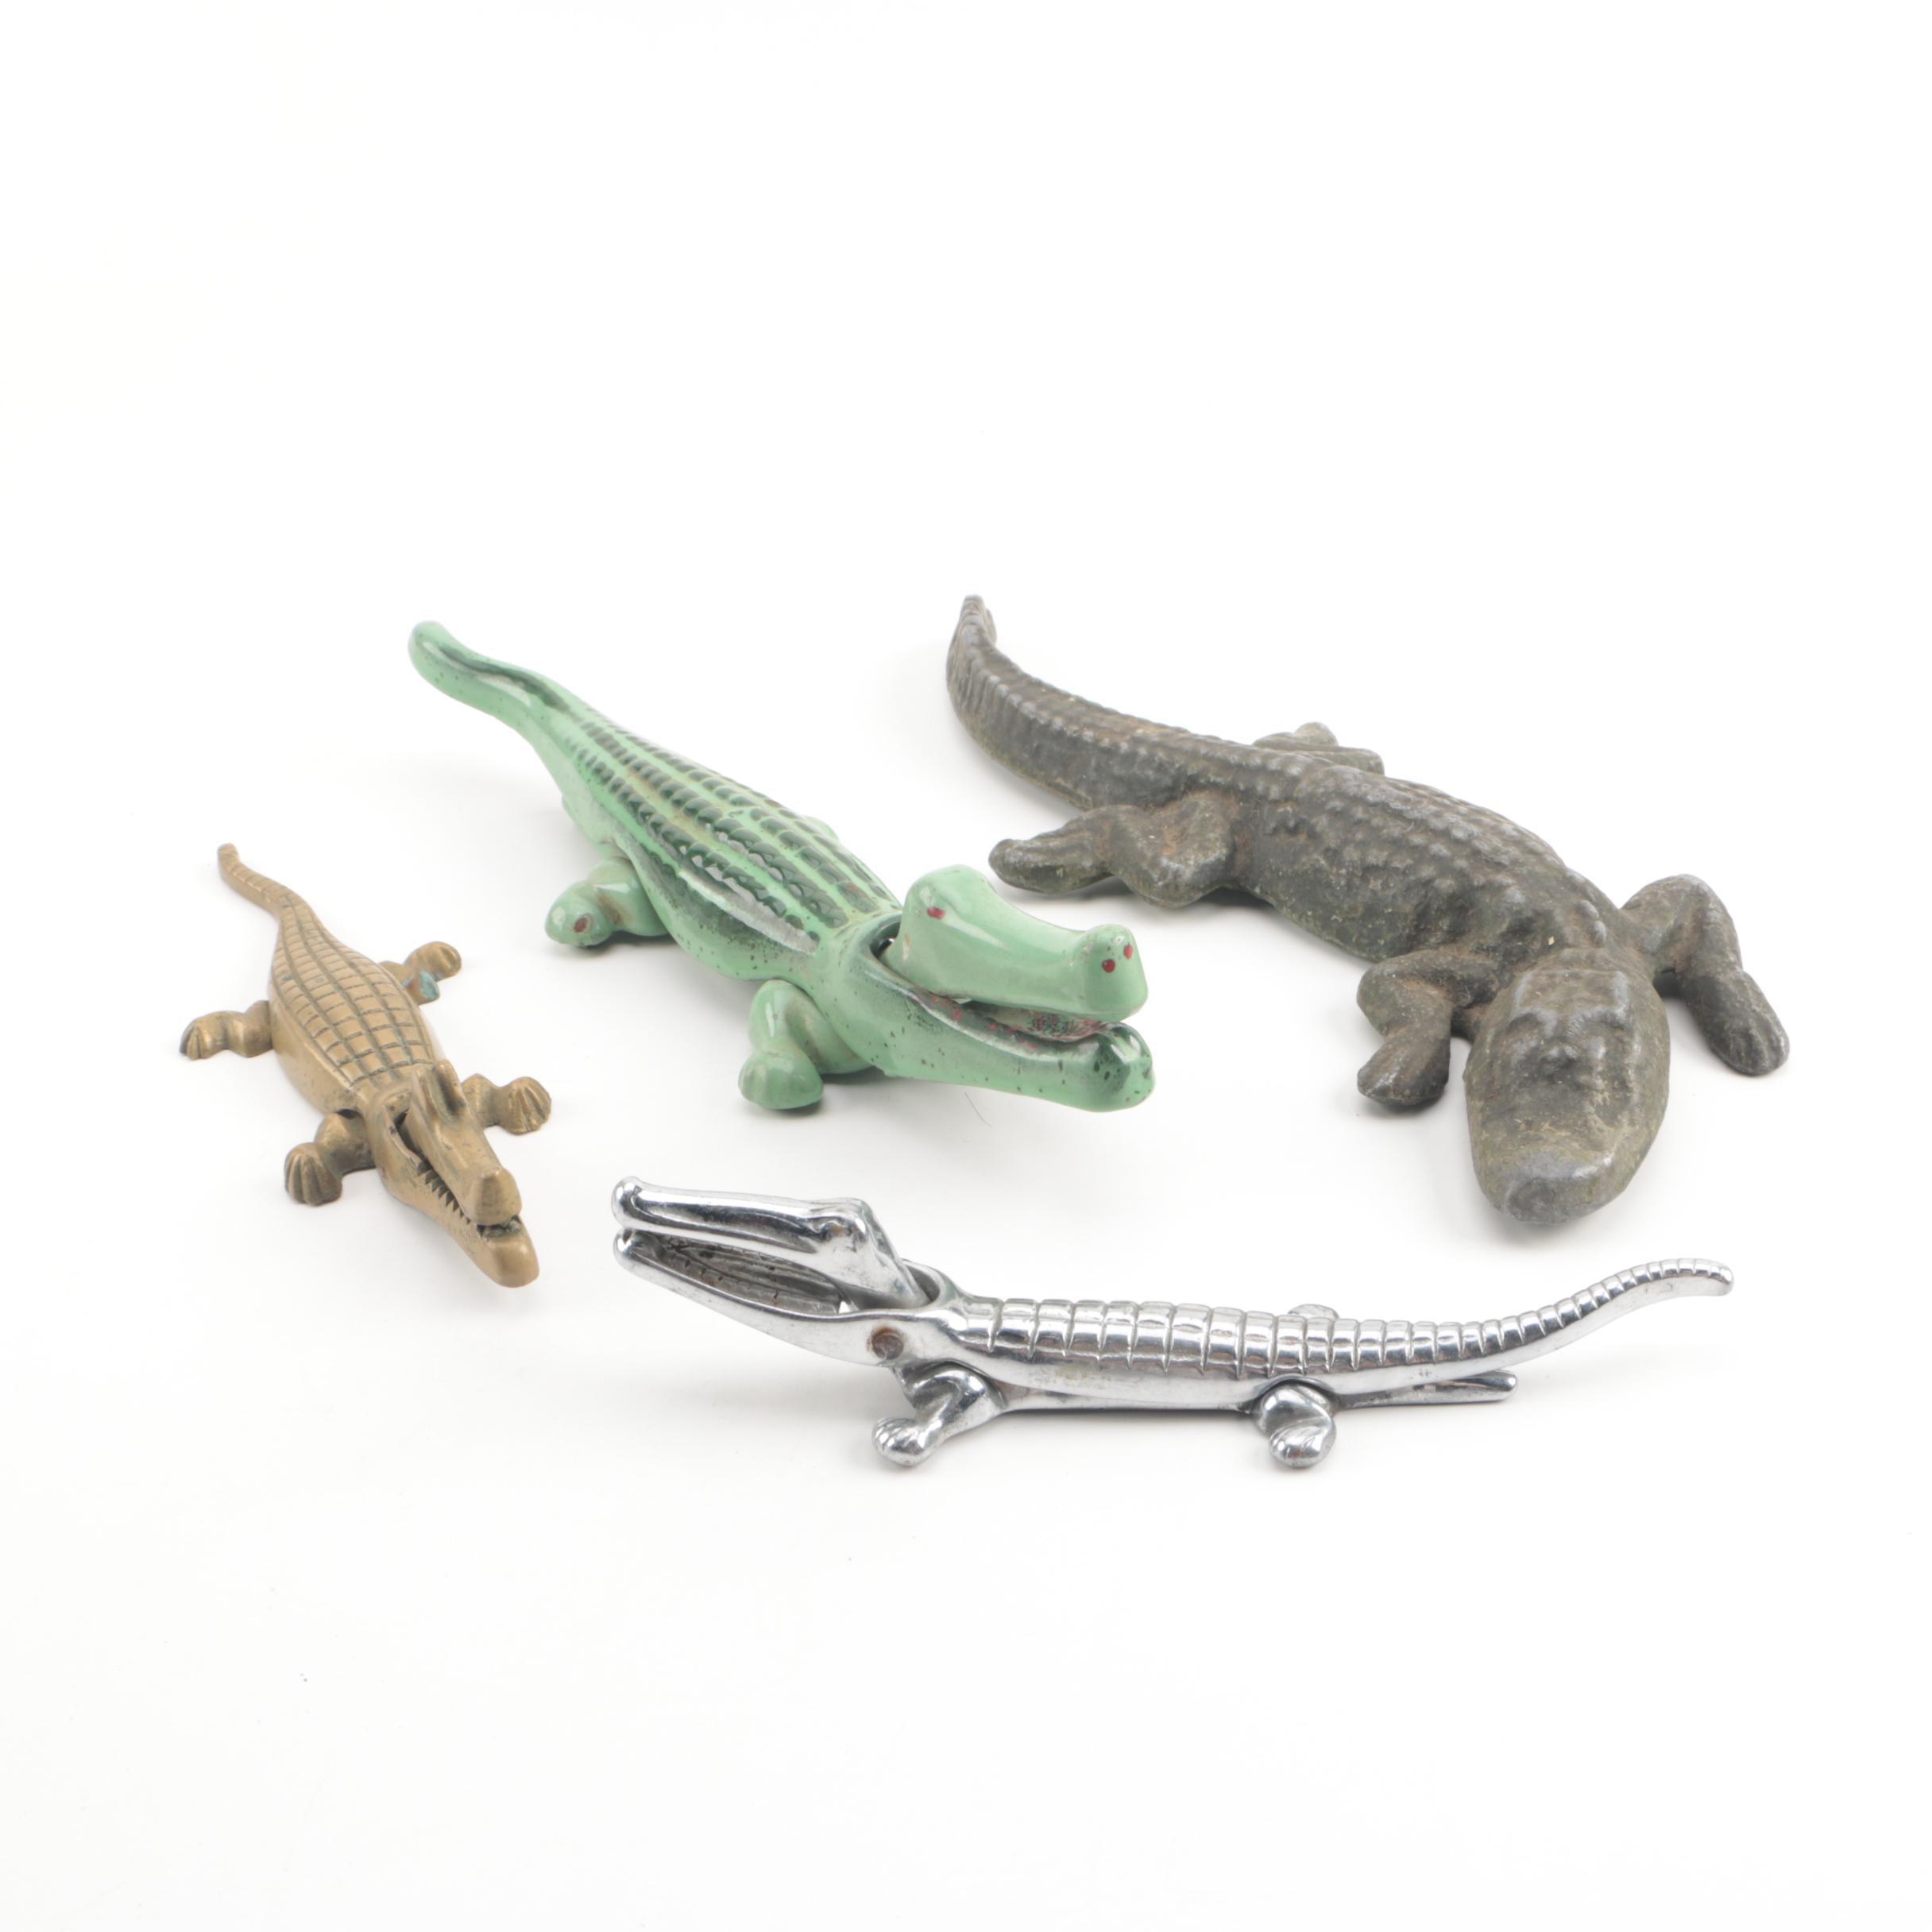 Metal Crocodile Nutcrackers and Alligator Figurine